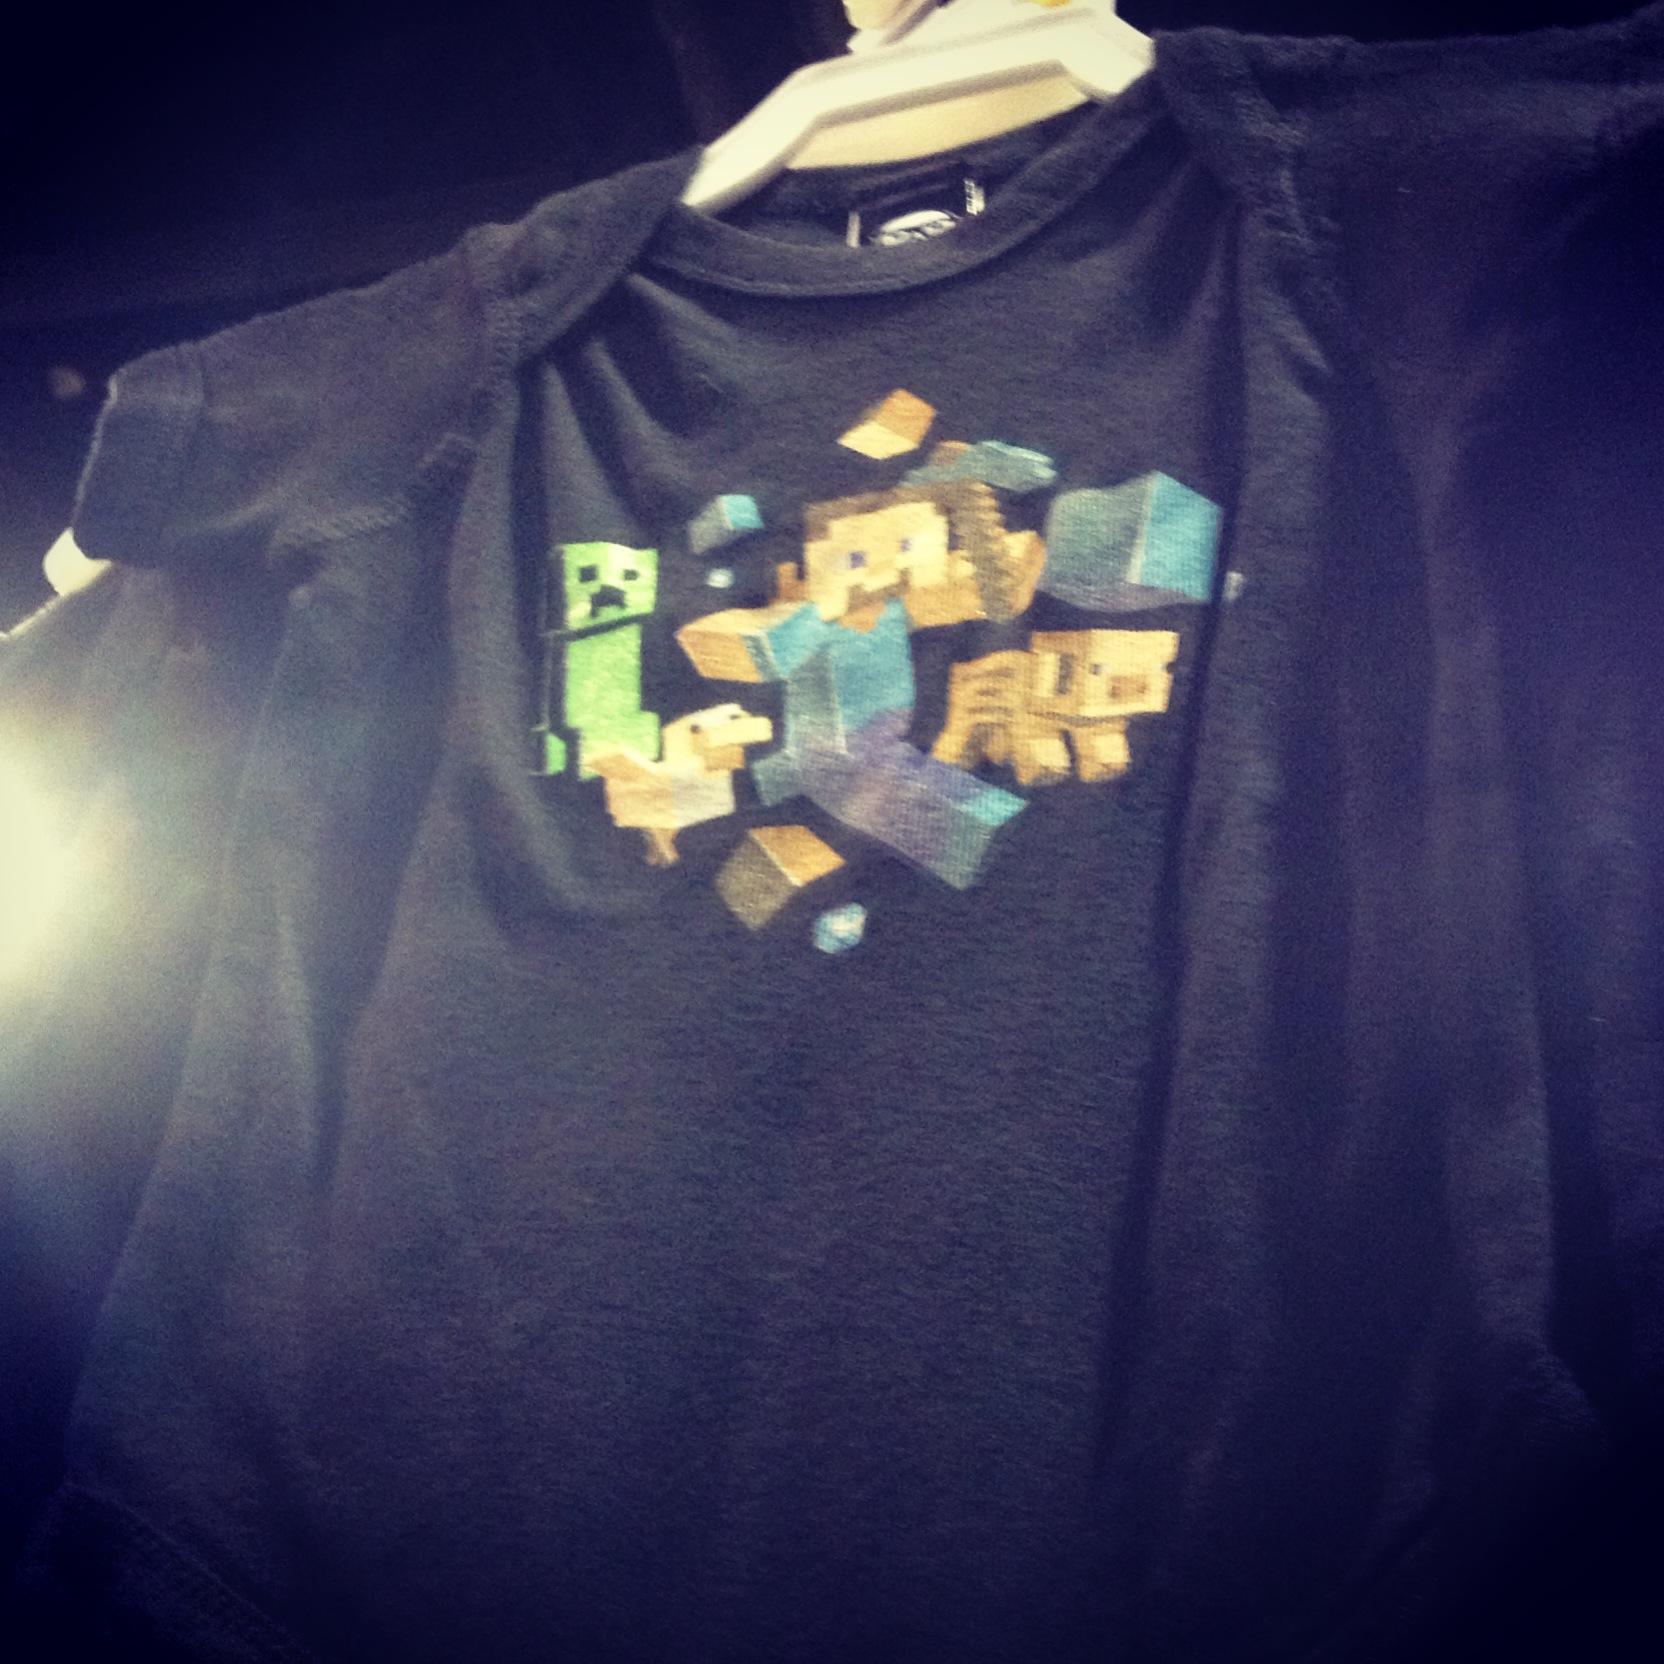 minecraft-shirt-heroes-con-2013.JPG